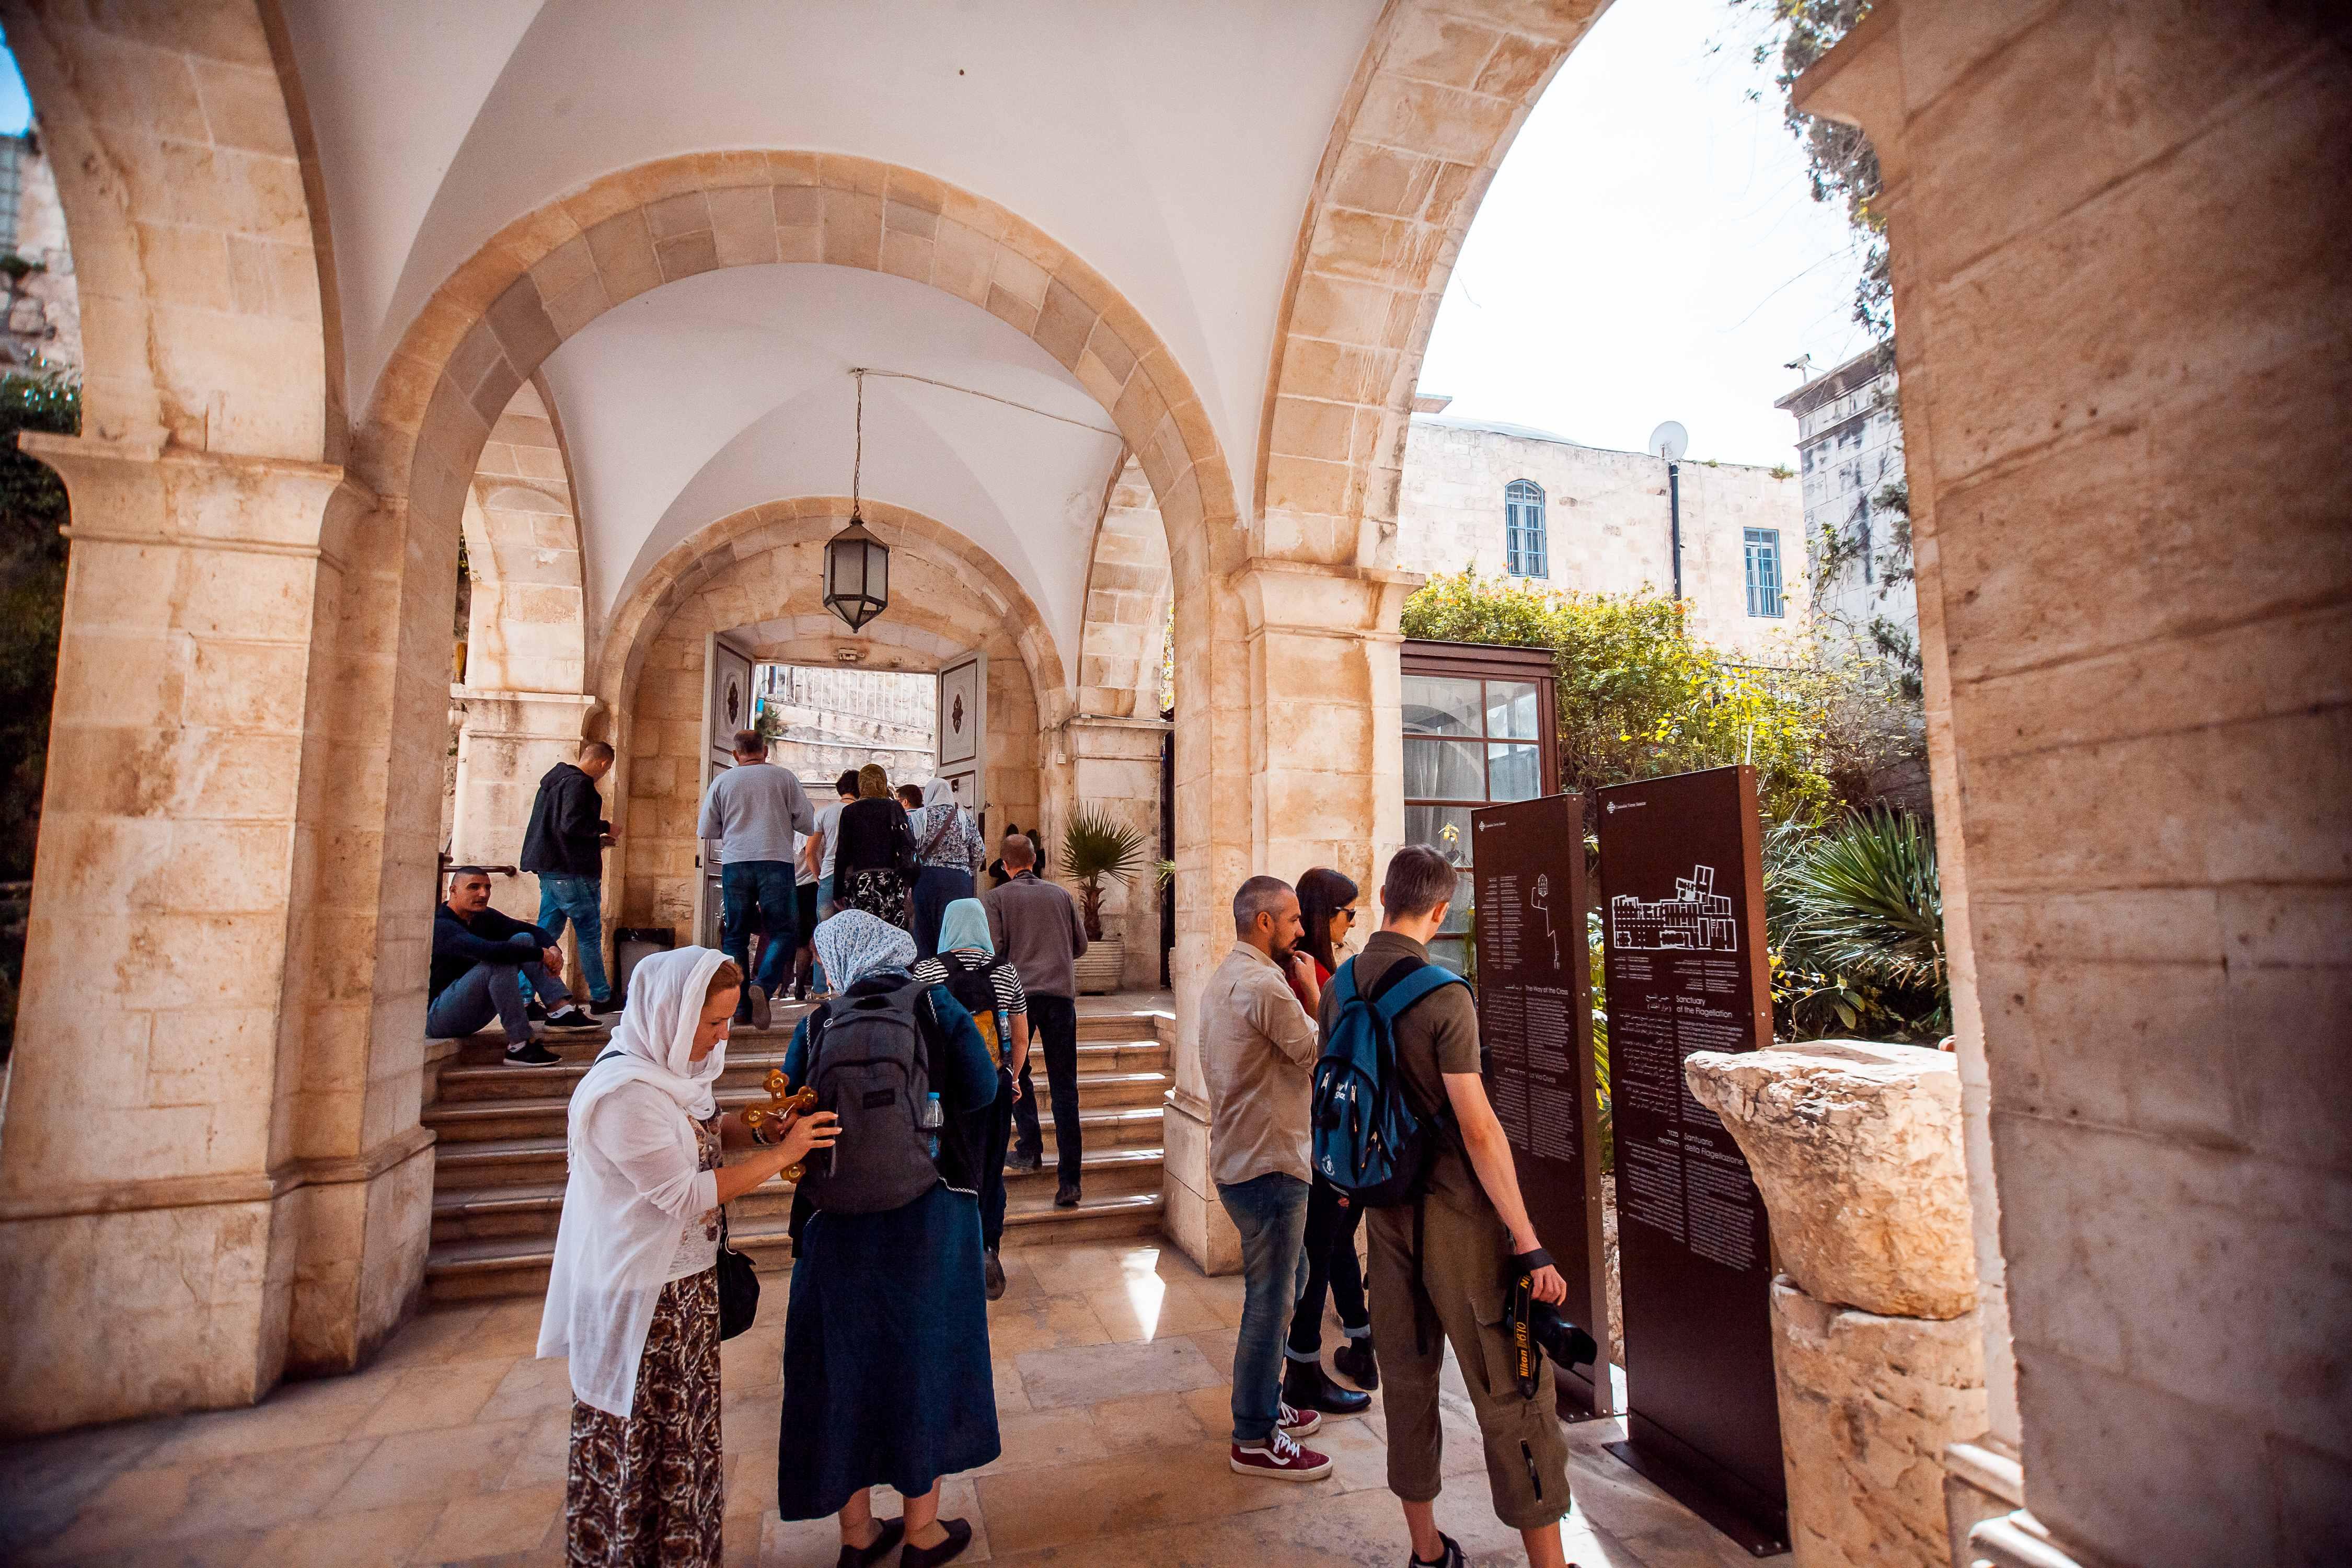 The Terra Sancta Museum, Jerusalem, Israel, 2017 | © Courtesy of Tamschick Media.